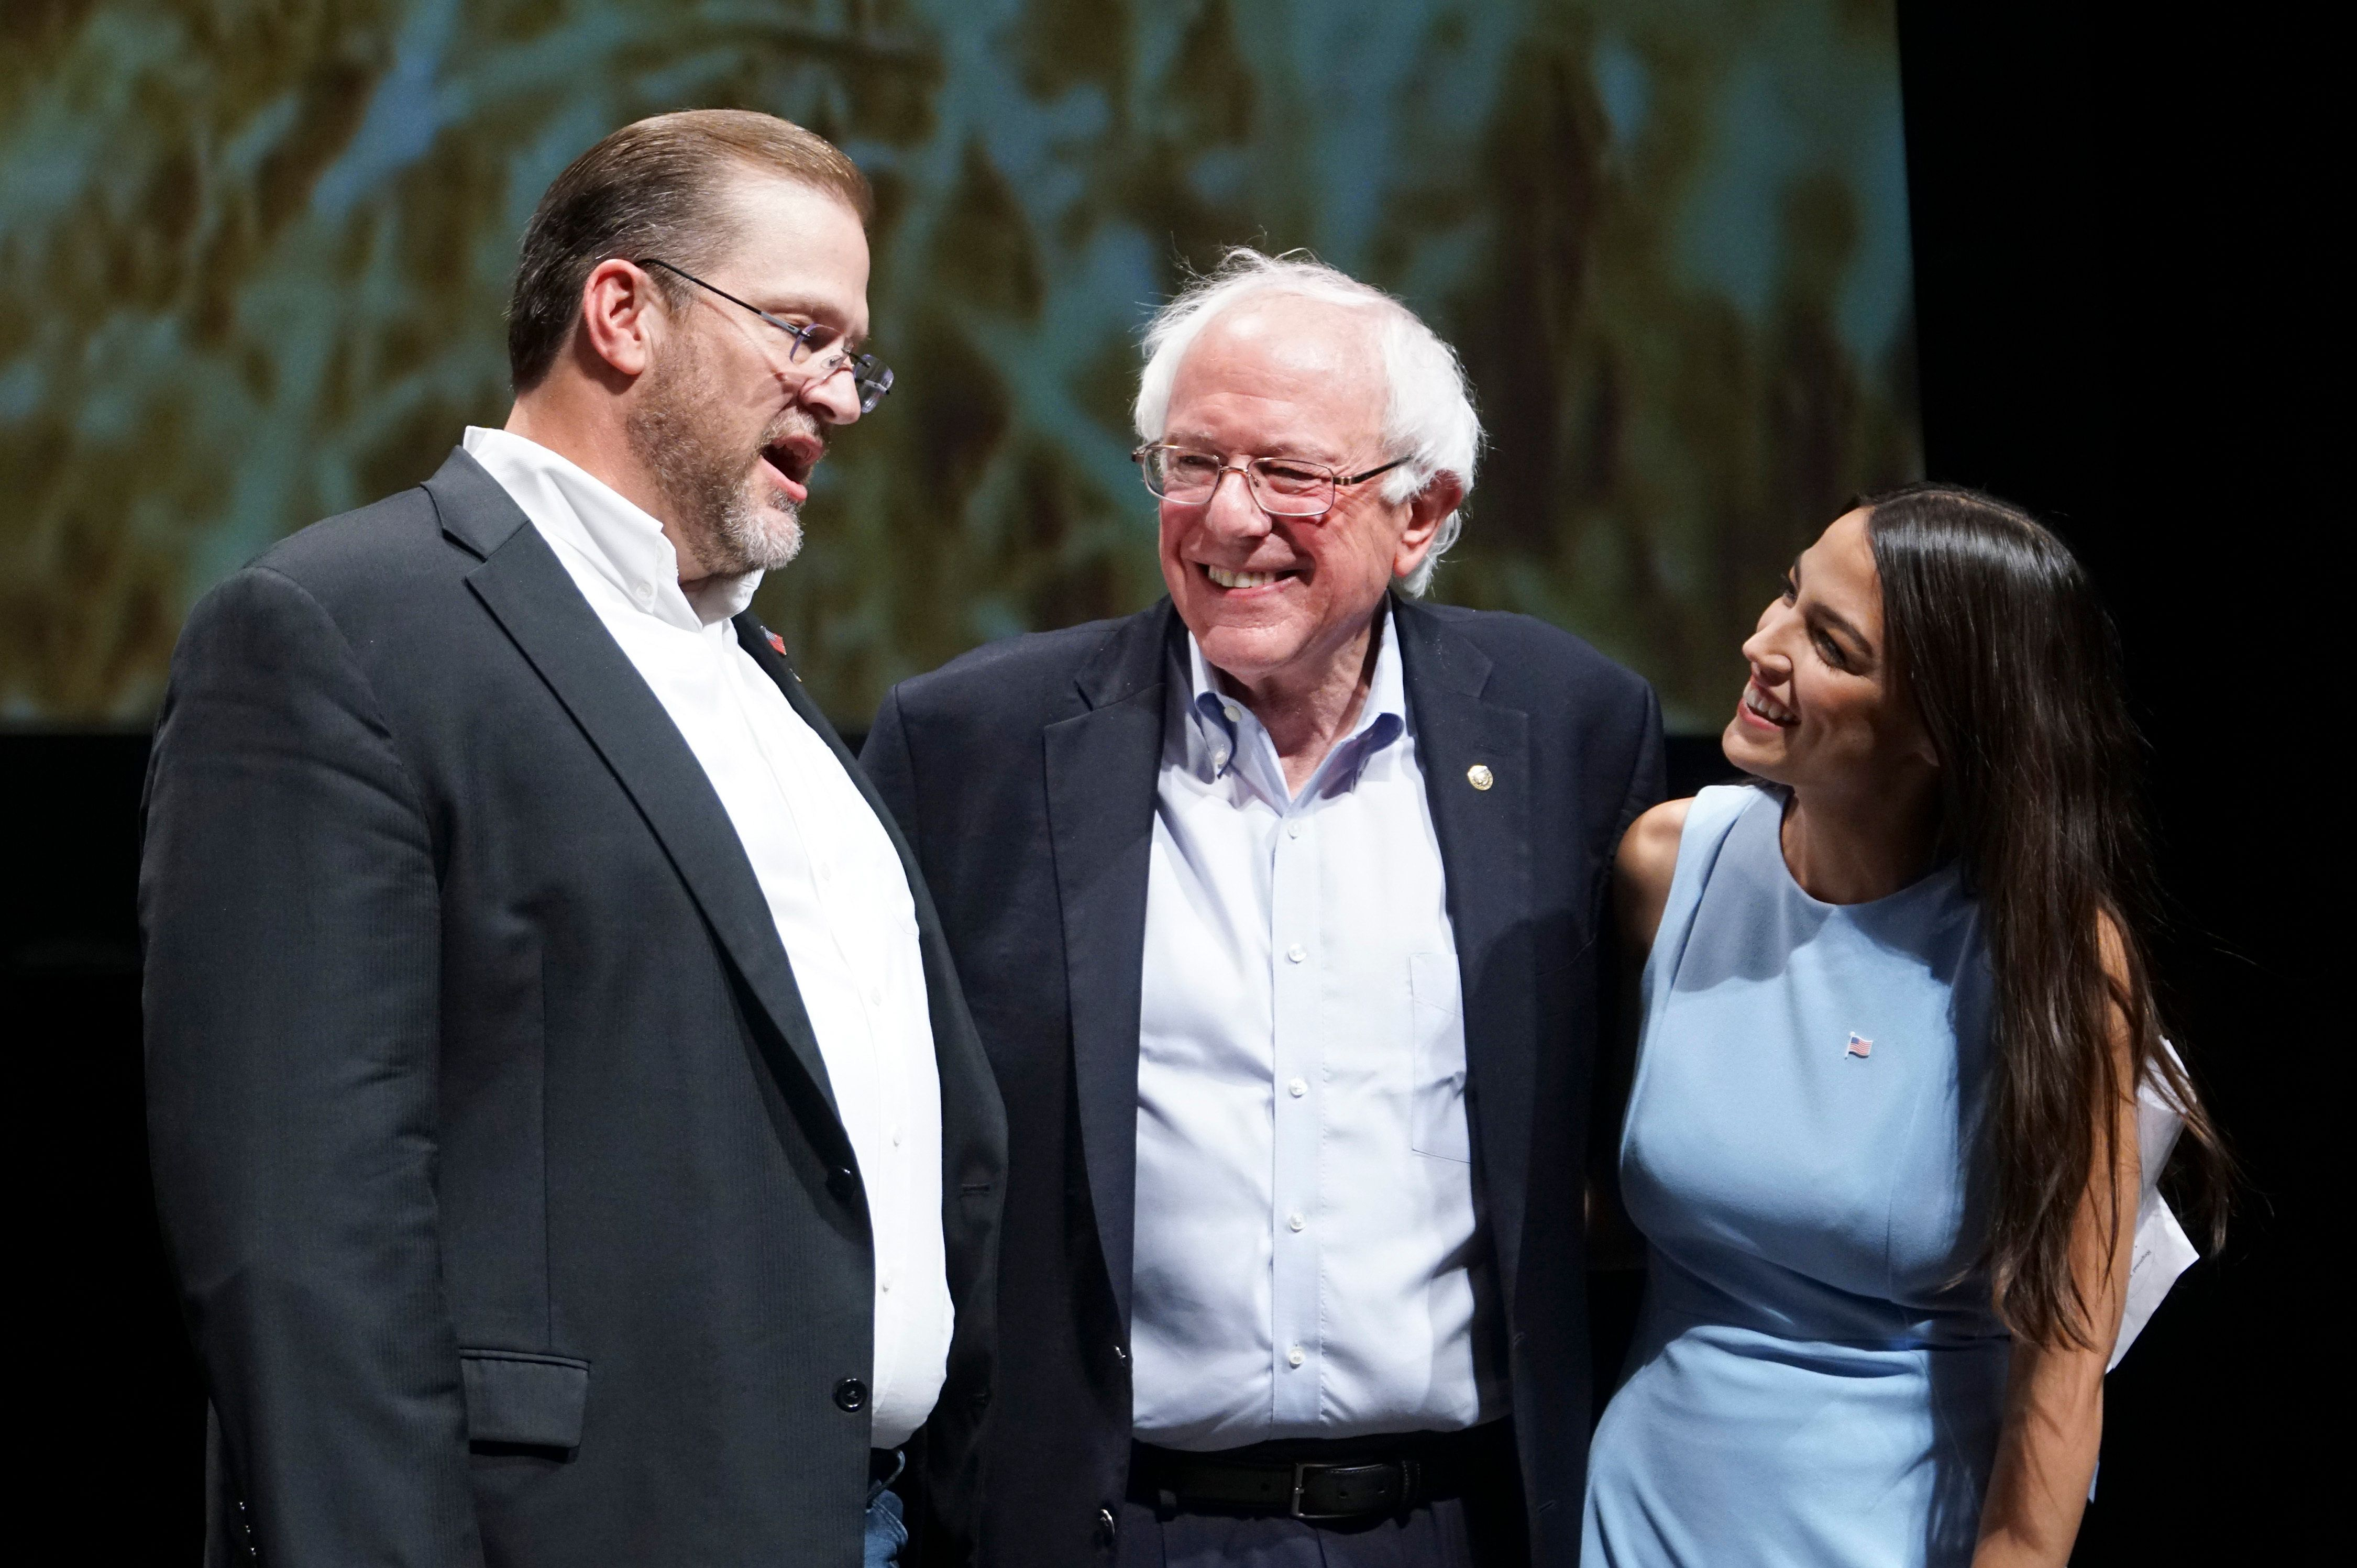 huffingtonpost.com - Kevin Robillard - Bernie Sanders, Alexandria Ocasio-Cortez Bring A Joint Progressive Push To Kansas